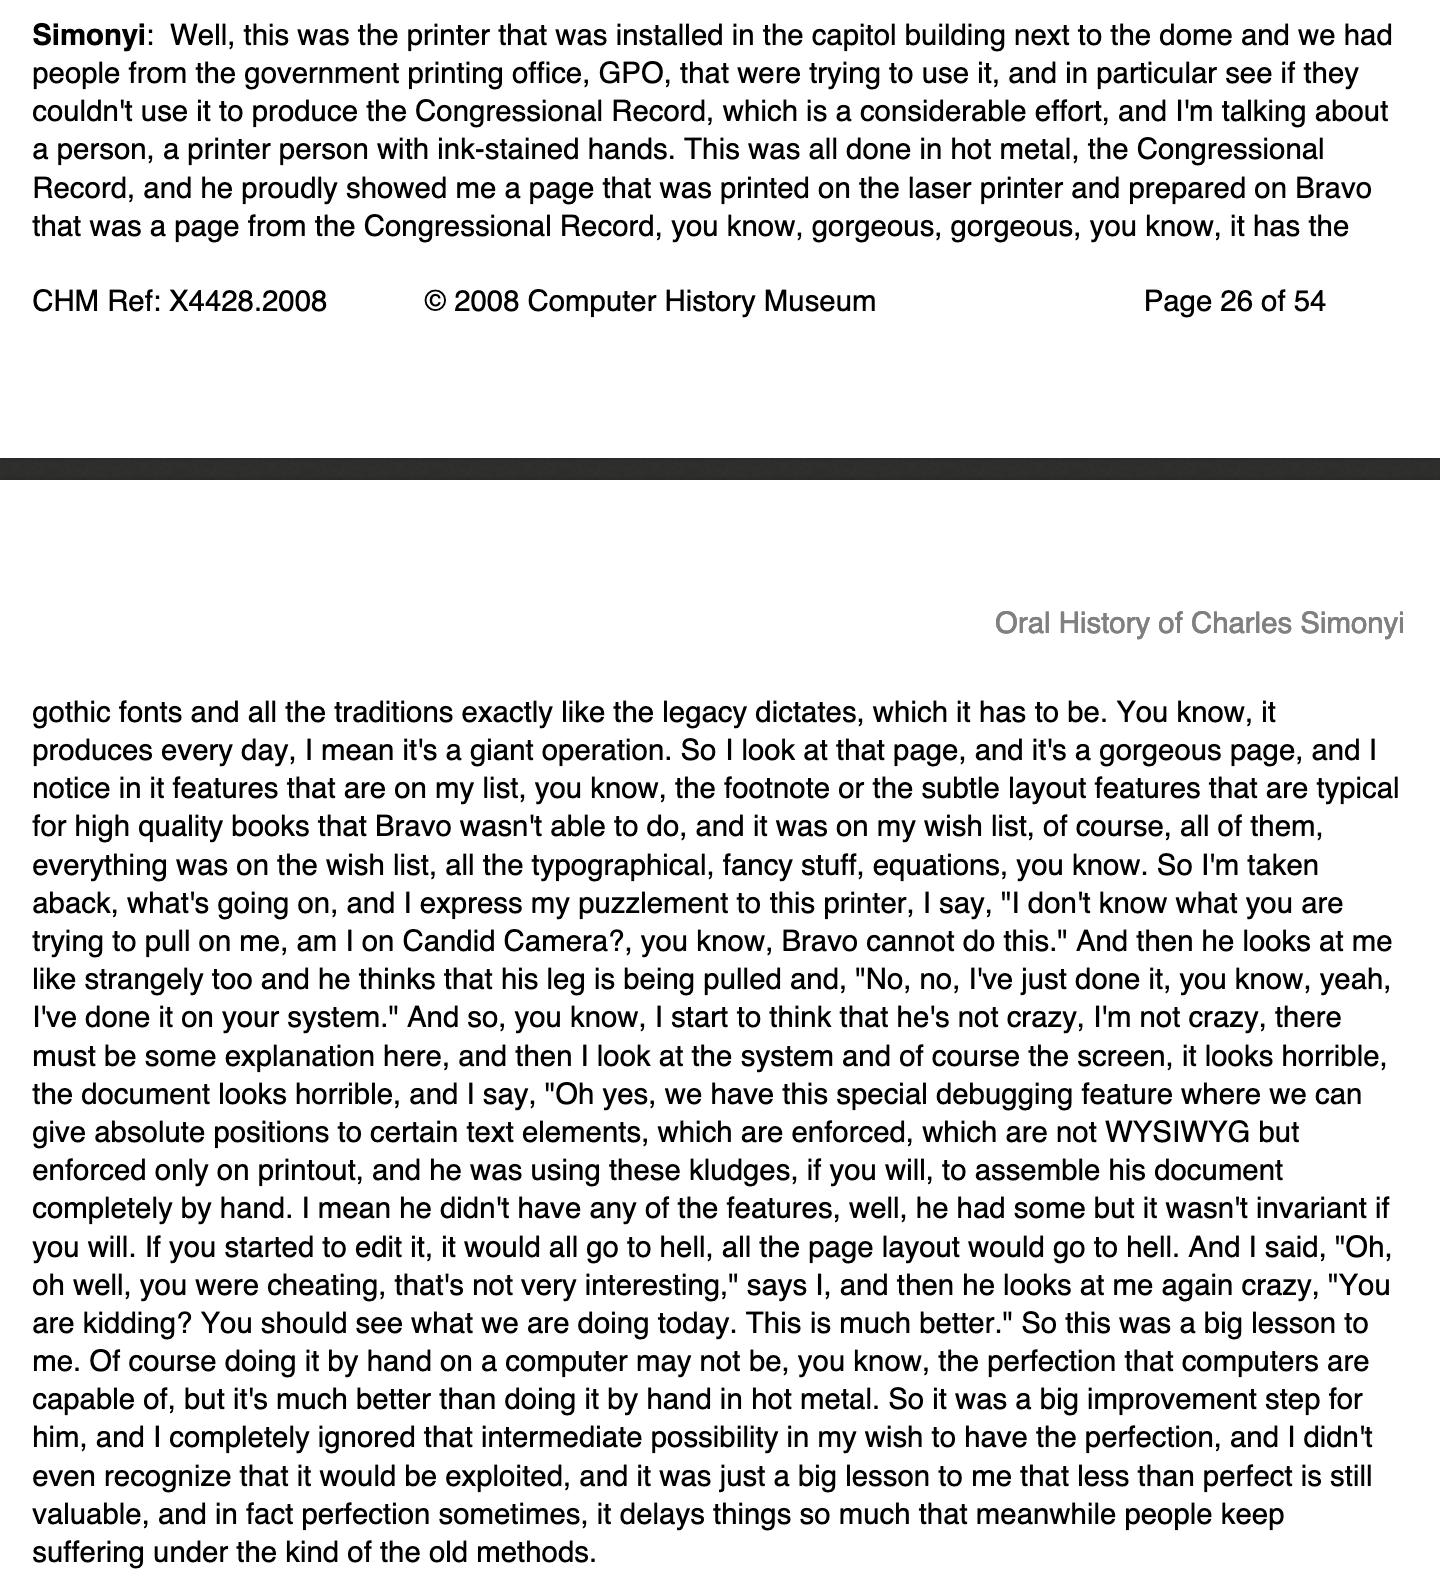 screenshot of text from Simonyi on printers